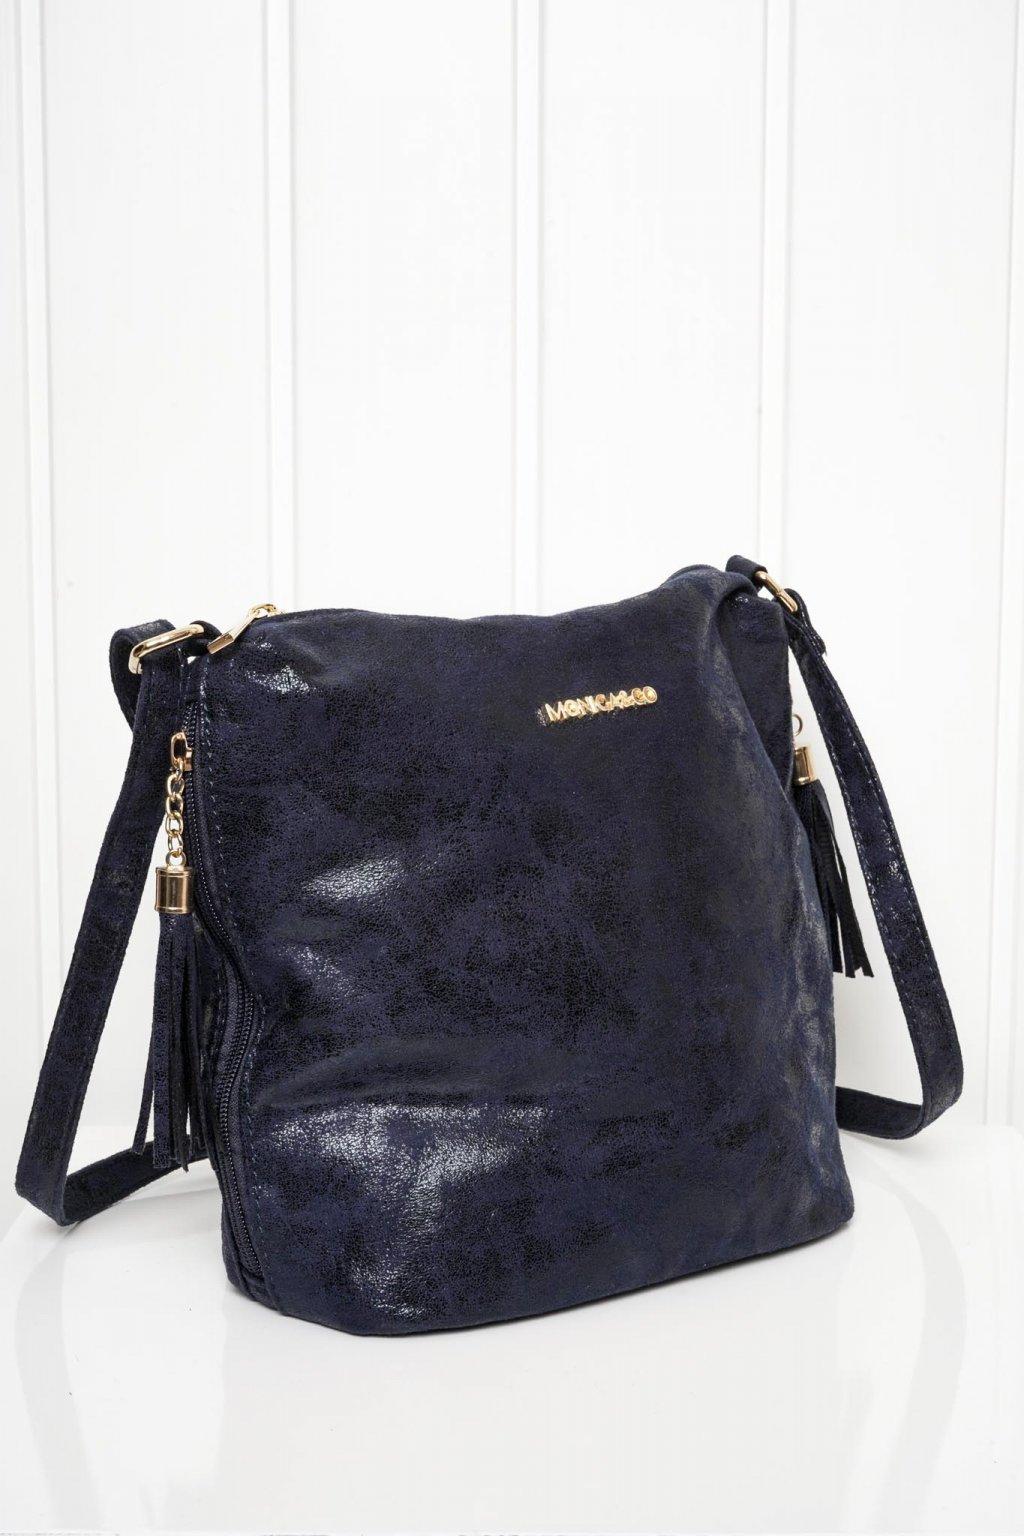 Kabelka, crossbody, ruksak, shopping bag, shopperka, 311